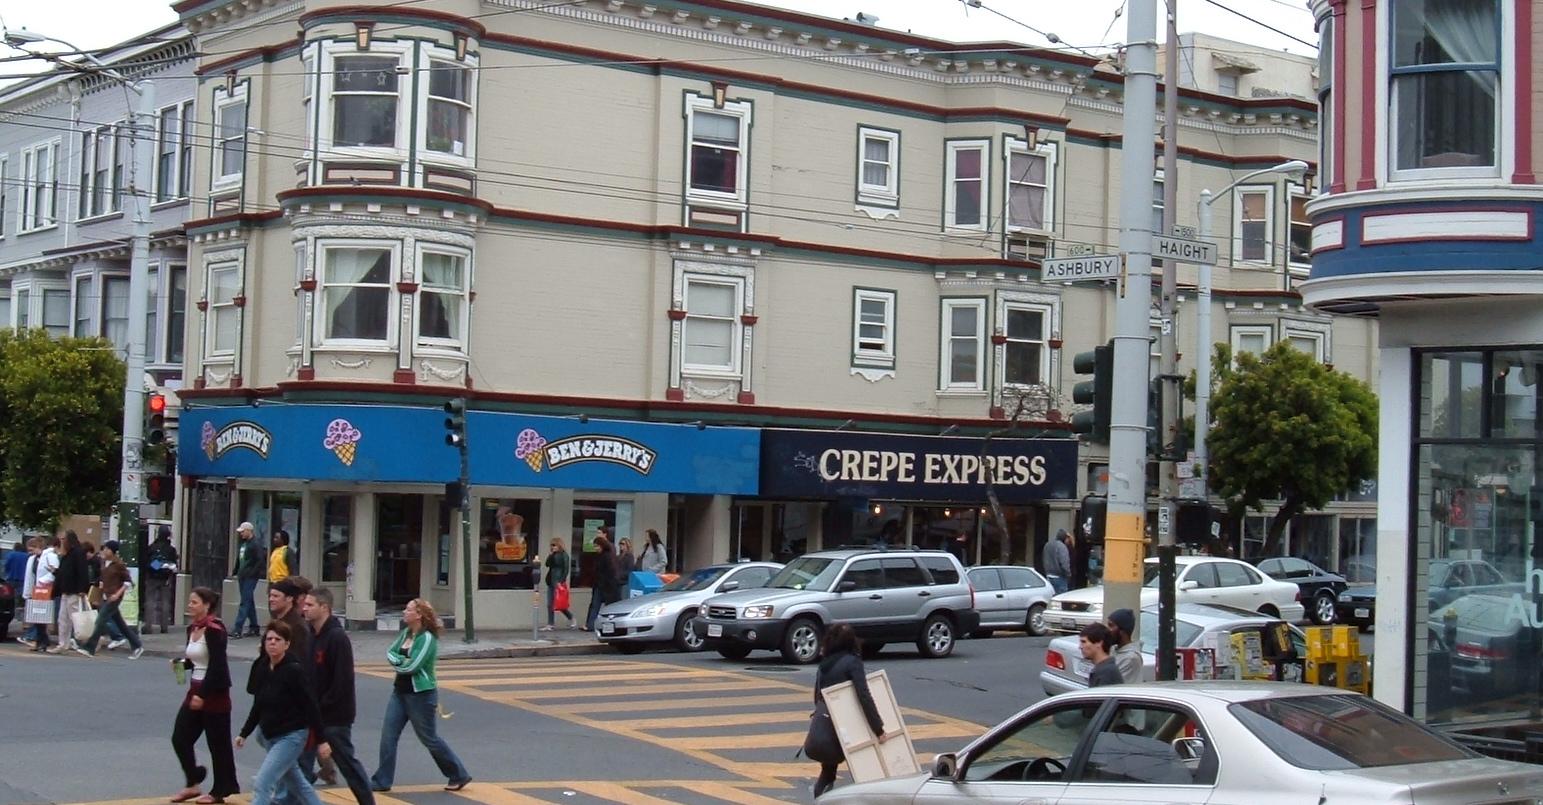 Haight Ashbury San Francisco Watch Dogs